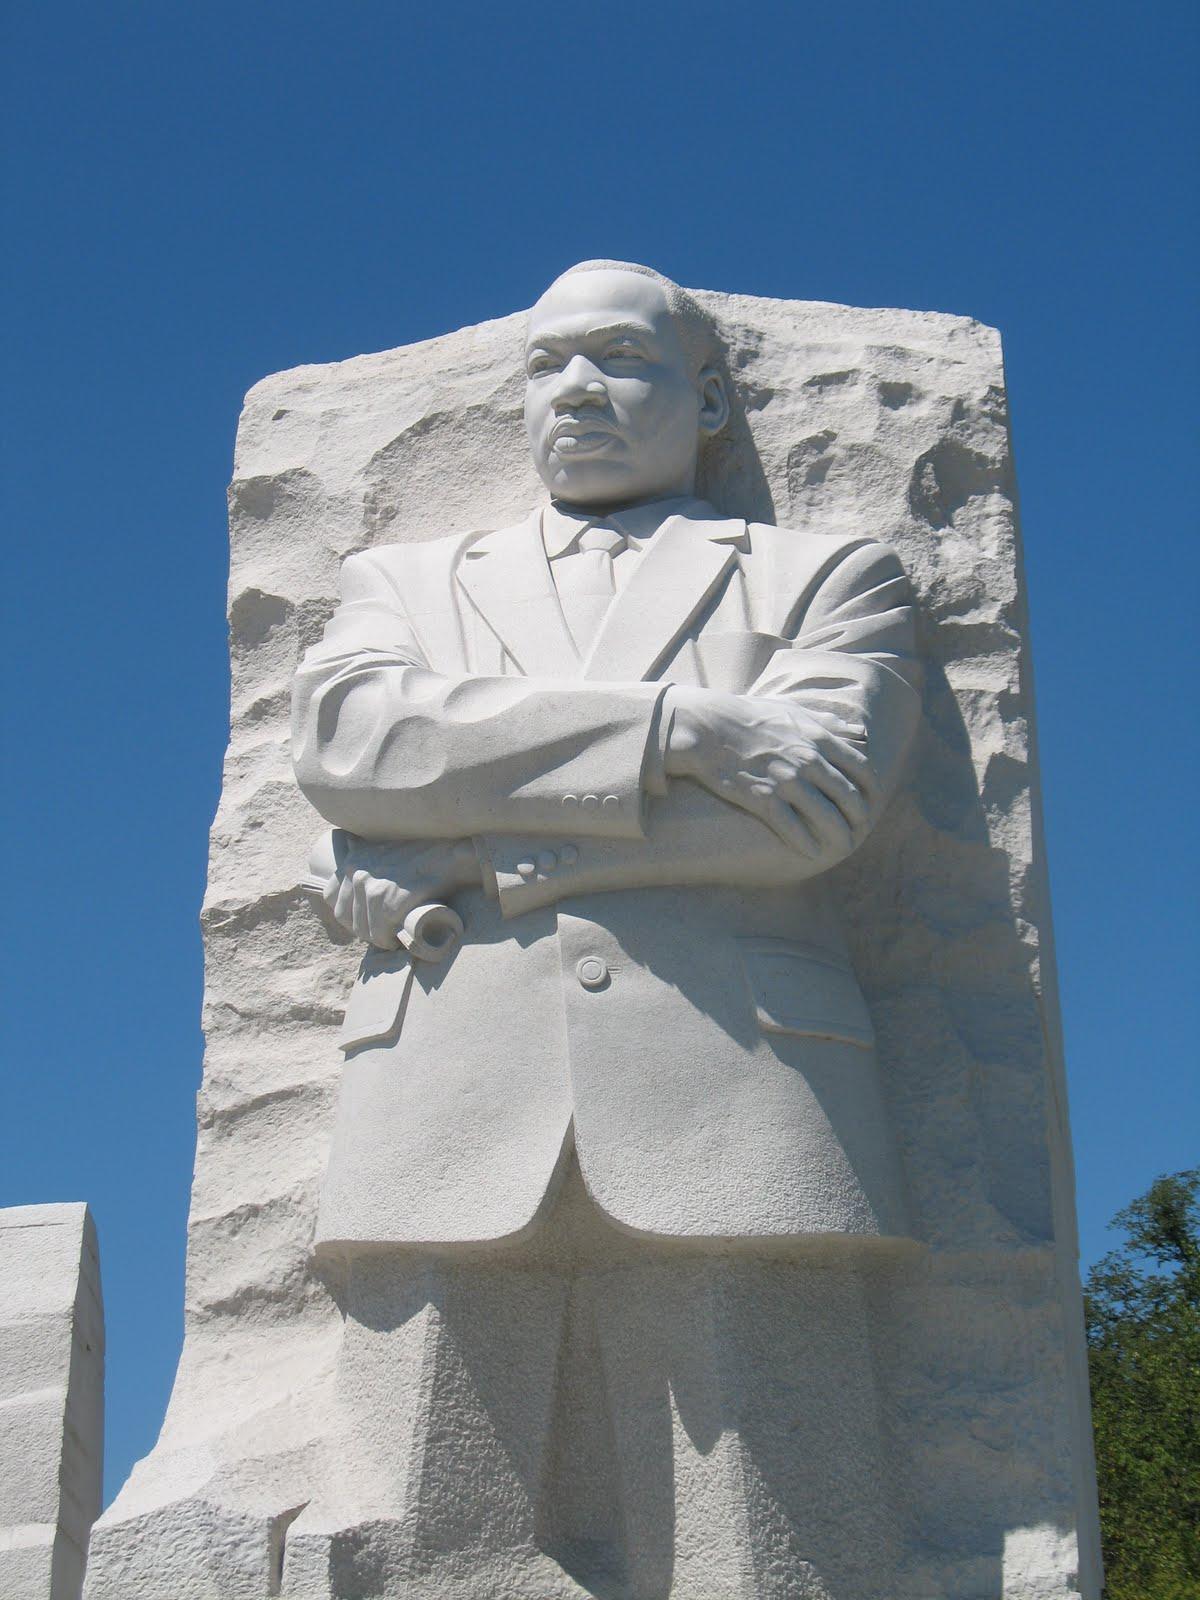 Washington Buckeye: Martin Luther King, Jr., Memorial